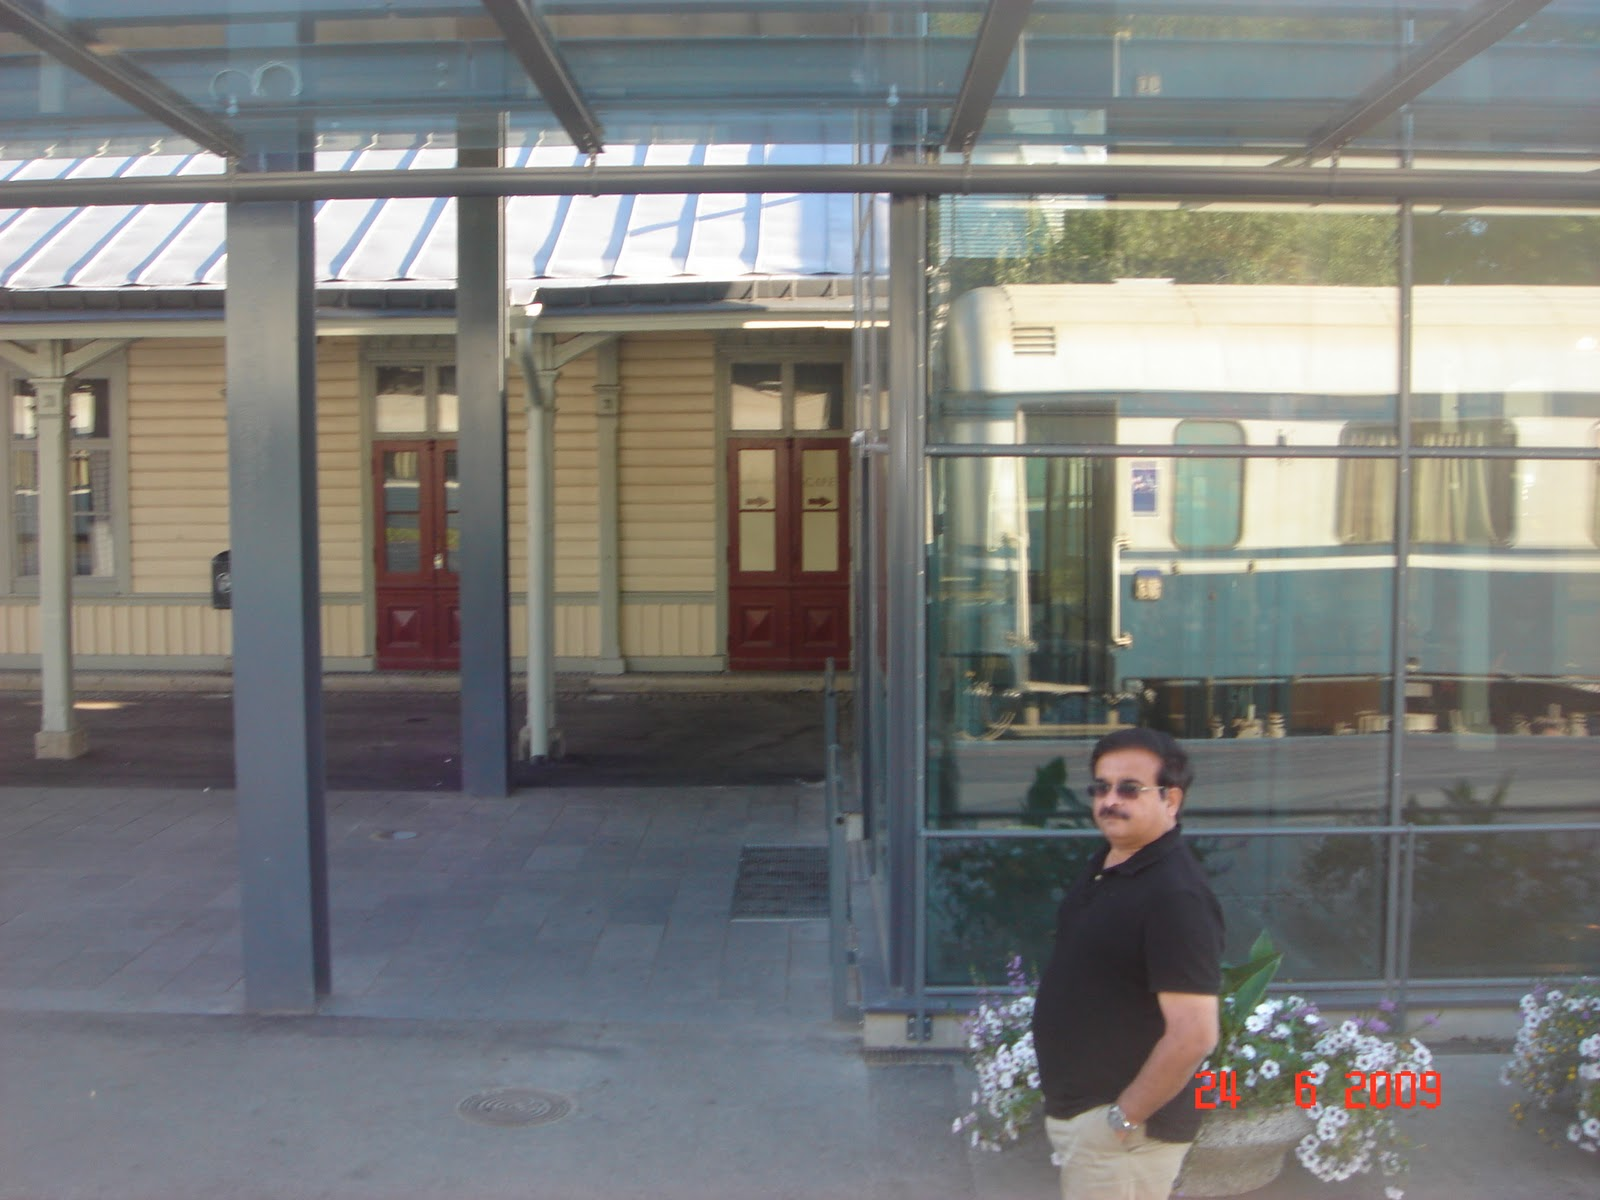 Vaasa railway Station,Finaland imageanchor=